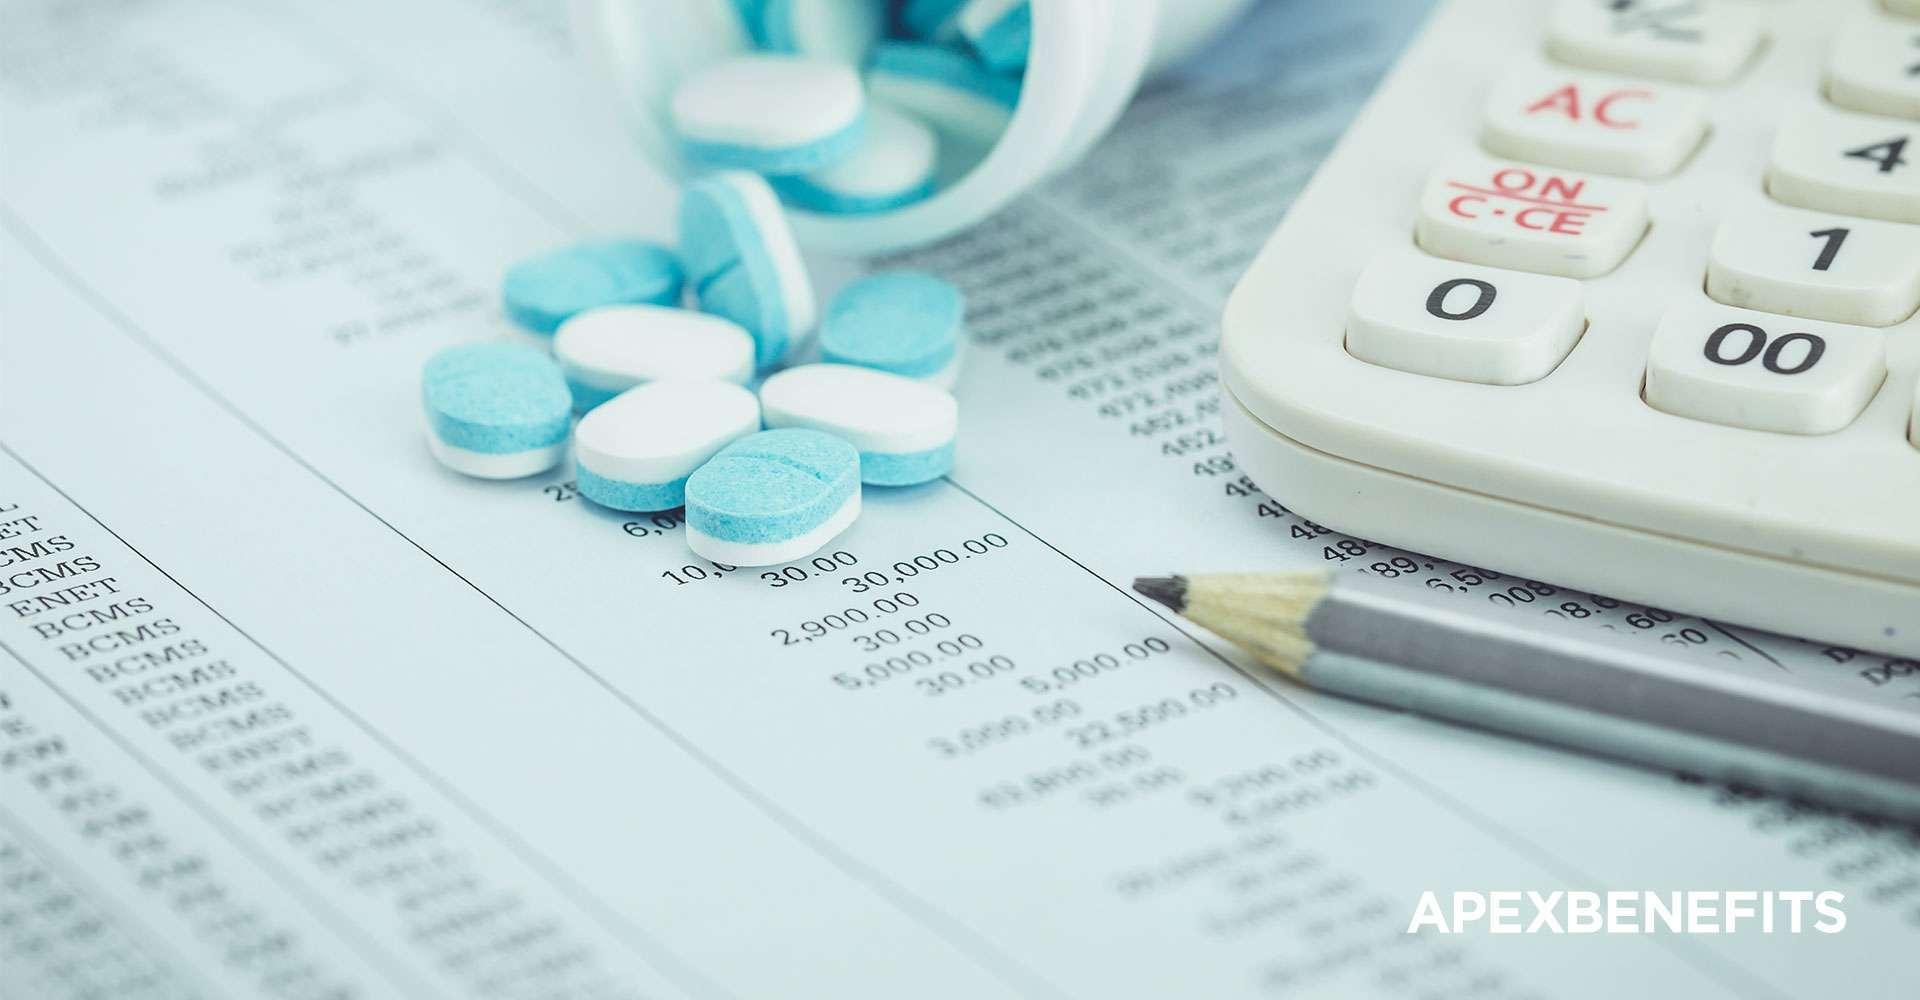 New EmployersRx Coalition Takes Legislative Approach to De-escalating Drug Prices